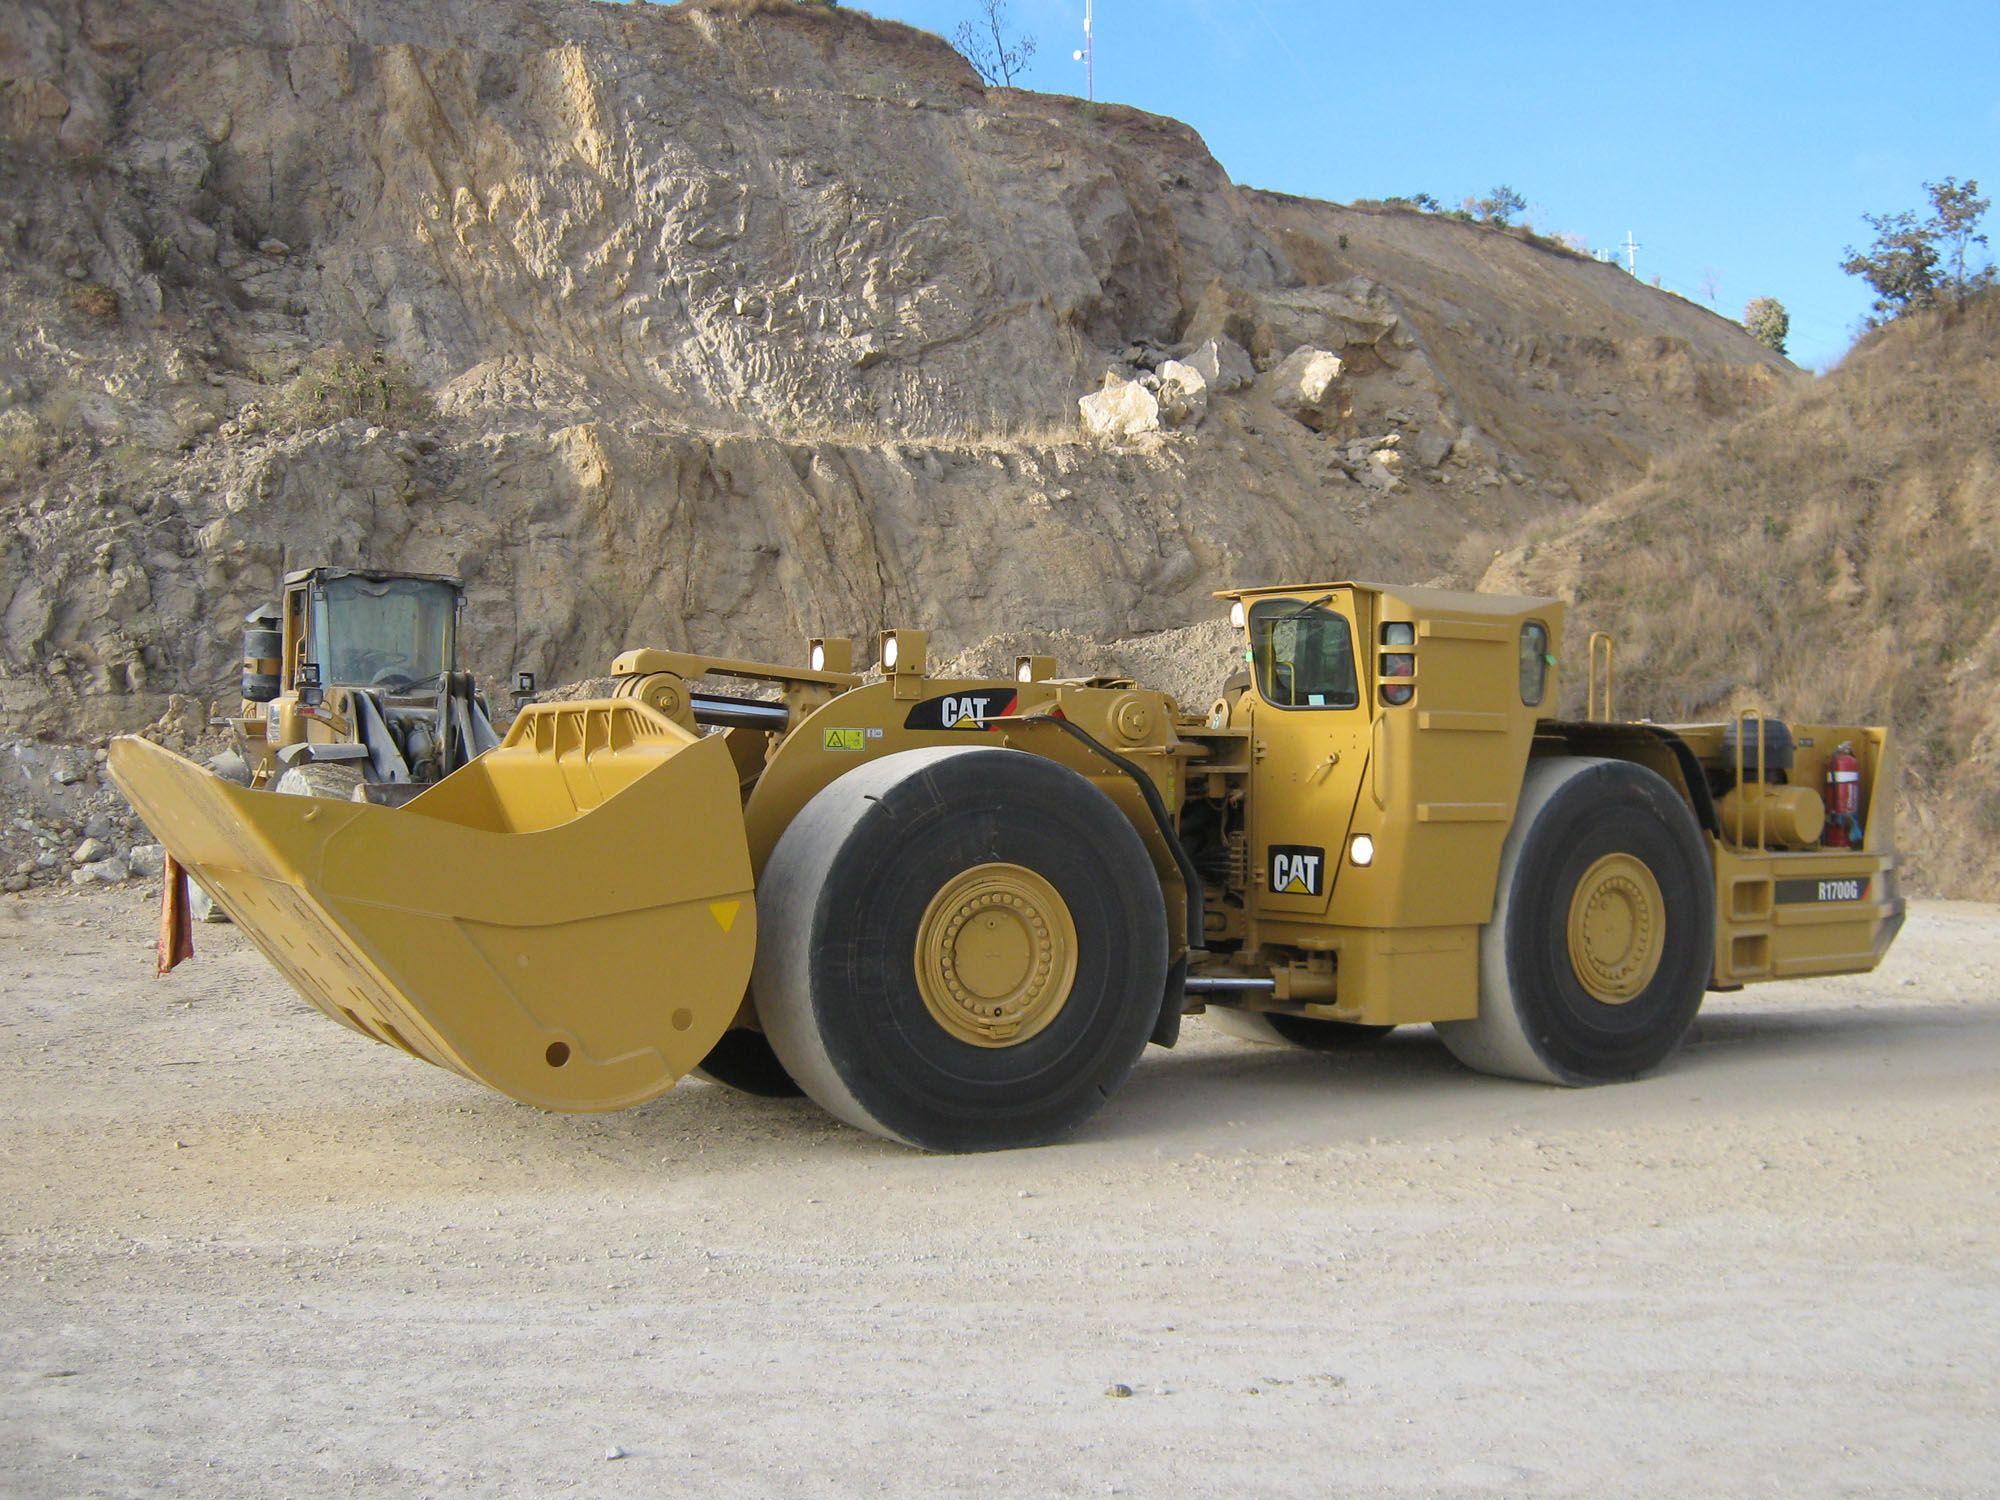 Cargador Frontal Caterpillar R1700g Heavy Construction Equipment Heavy Equipment Heavy Machinery